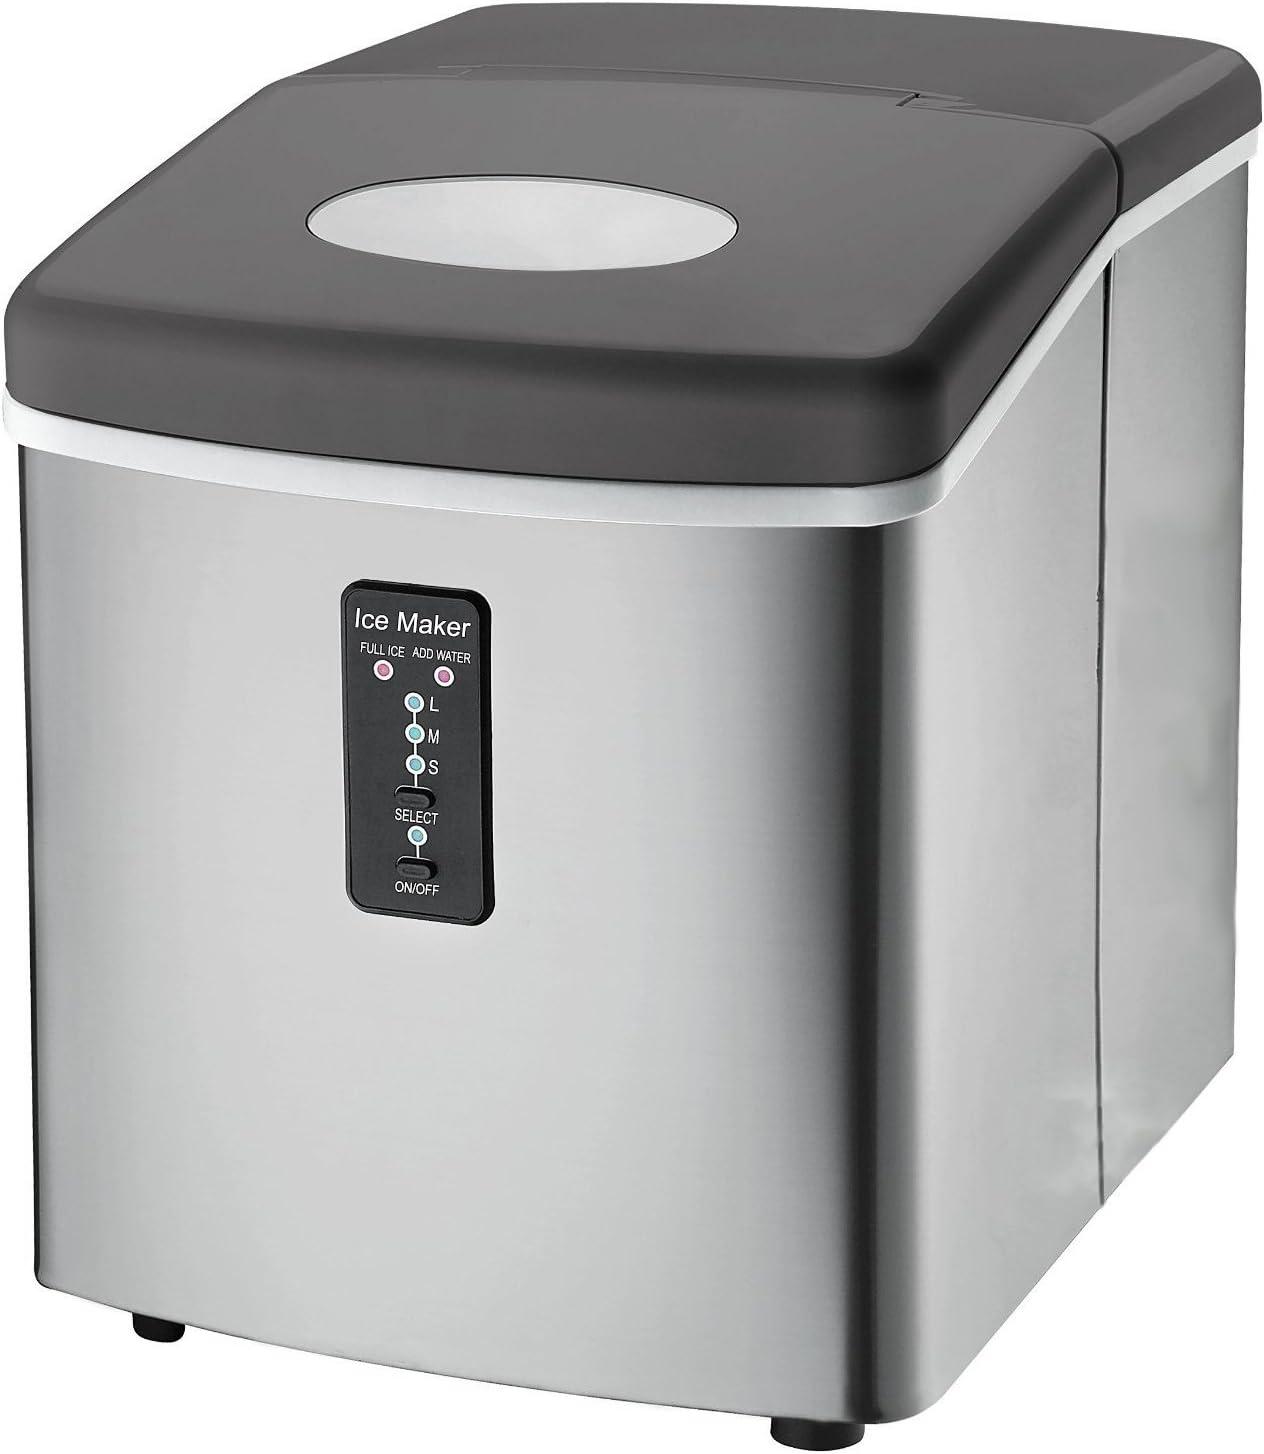 Think Gizmos portable ice maker